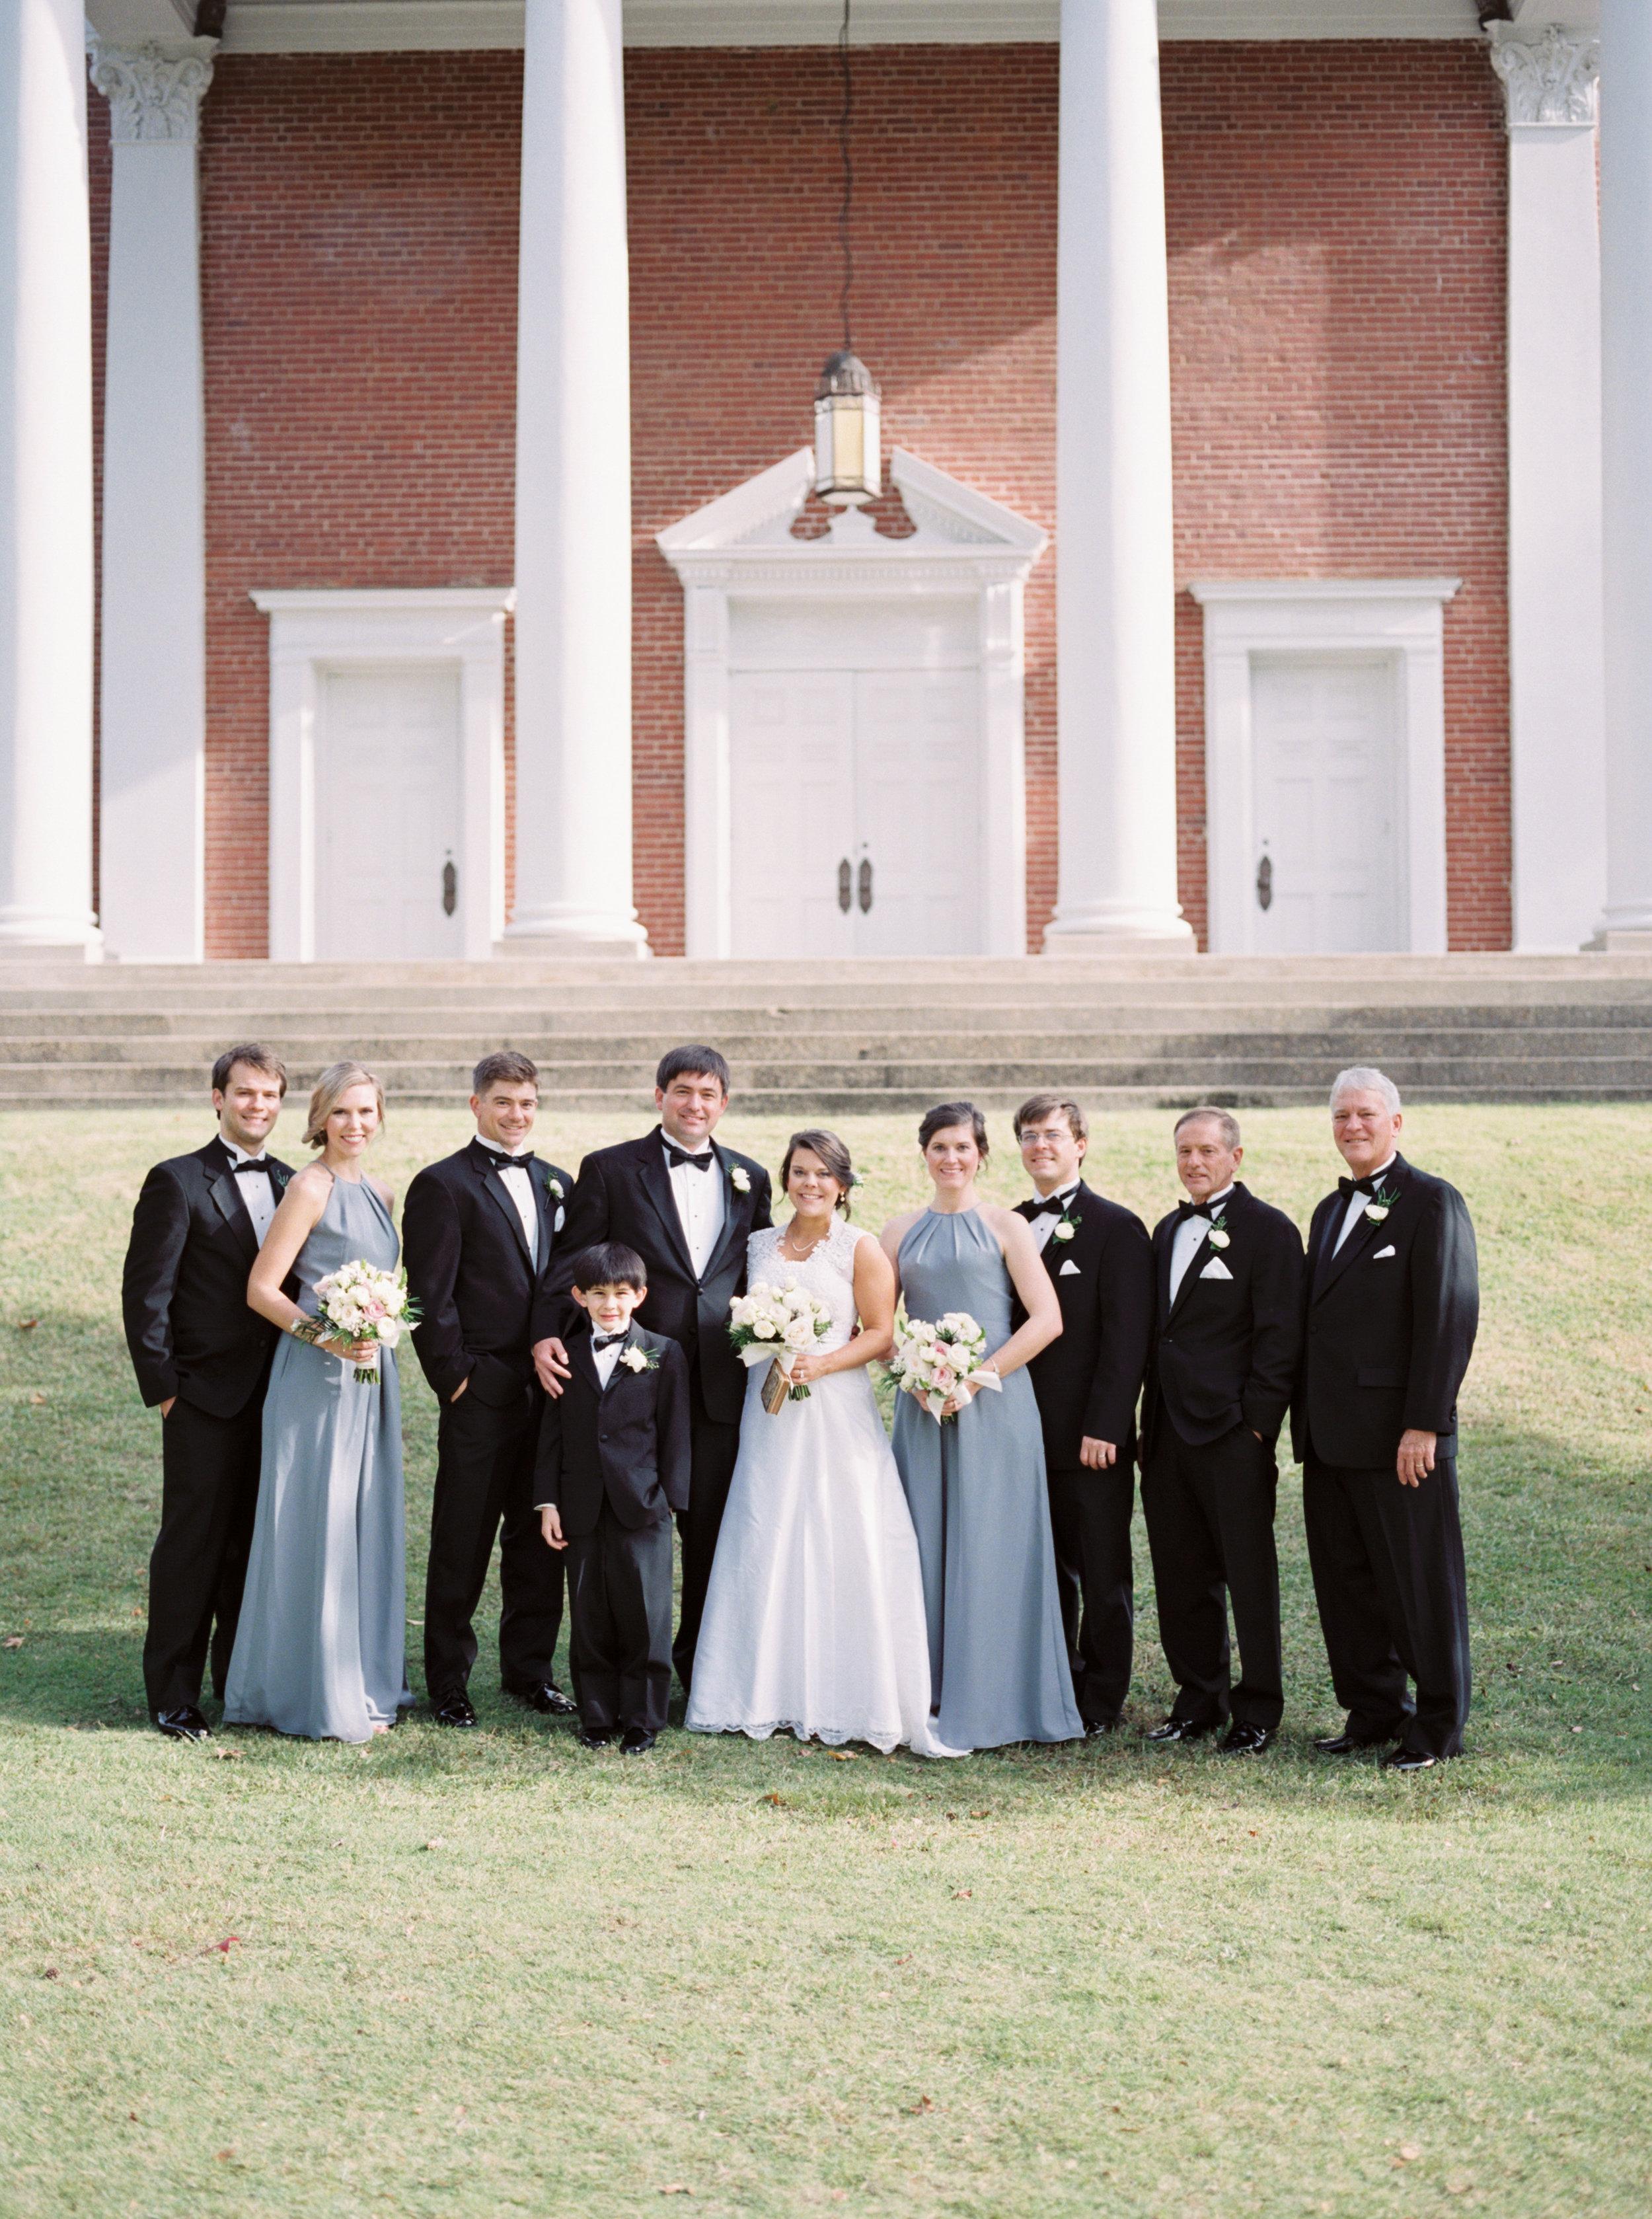 Fober_Wedding_Columbus_Georgia_Green_Island_Country_Club_Fallen_Photography_3b-5.JPG